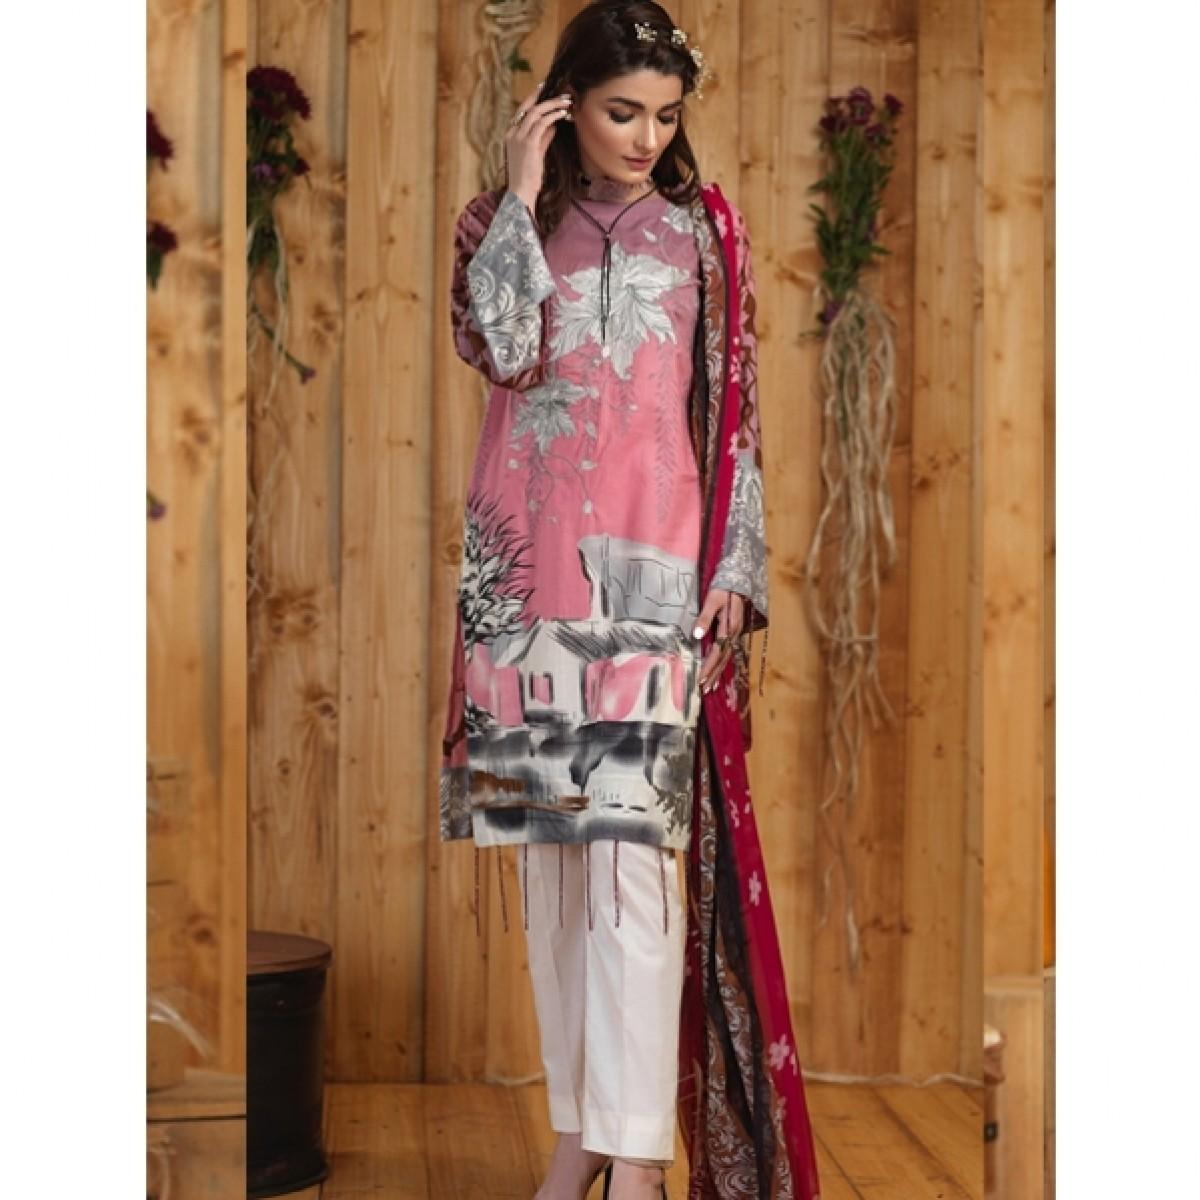 78f3c4e5ec Salitex Silkoria Emb Collection Vol 4 2019 (RC-160B) Price in Pakistan |  Buy Salitex Silkoria Lawn Collection 3 Piece | iShopping.pk